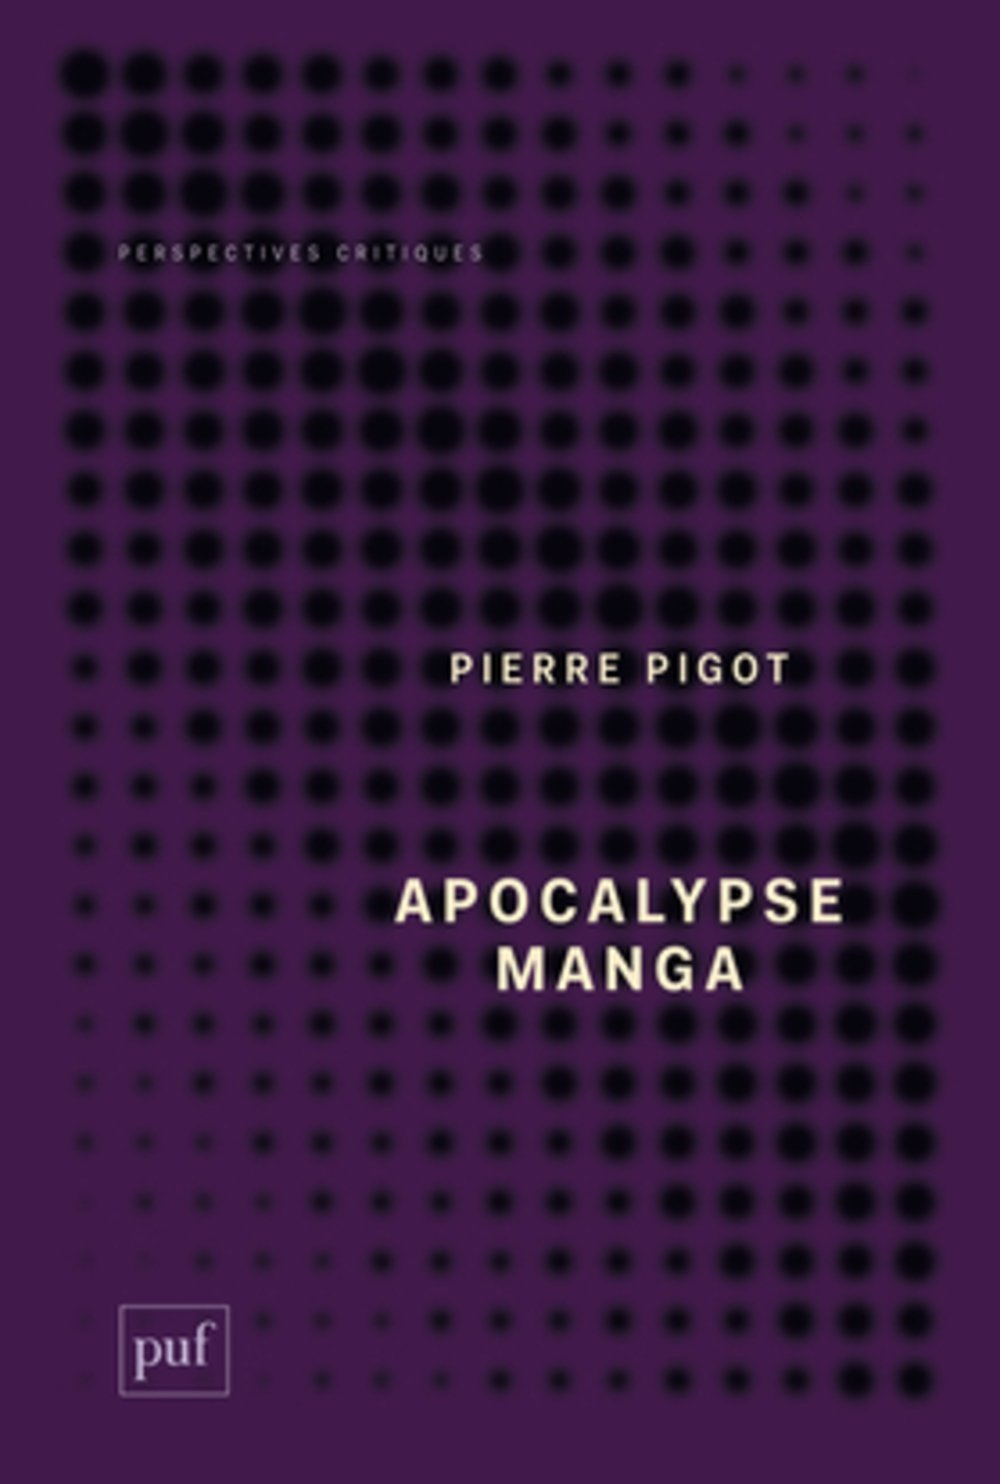 APOCALYPSE MANGA Pierre Pigot PUF